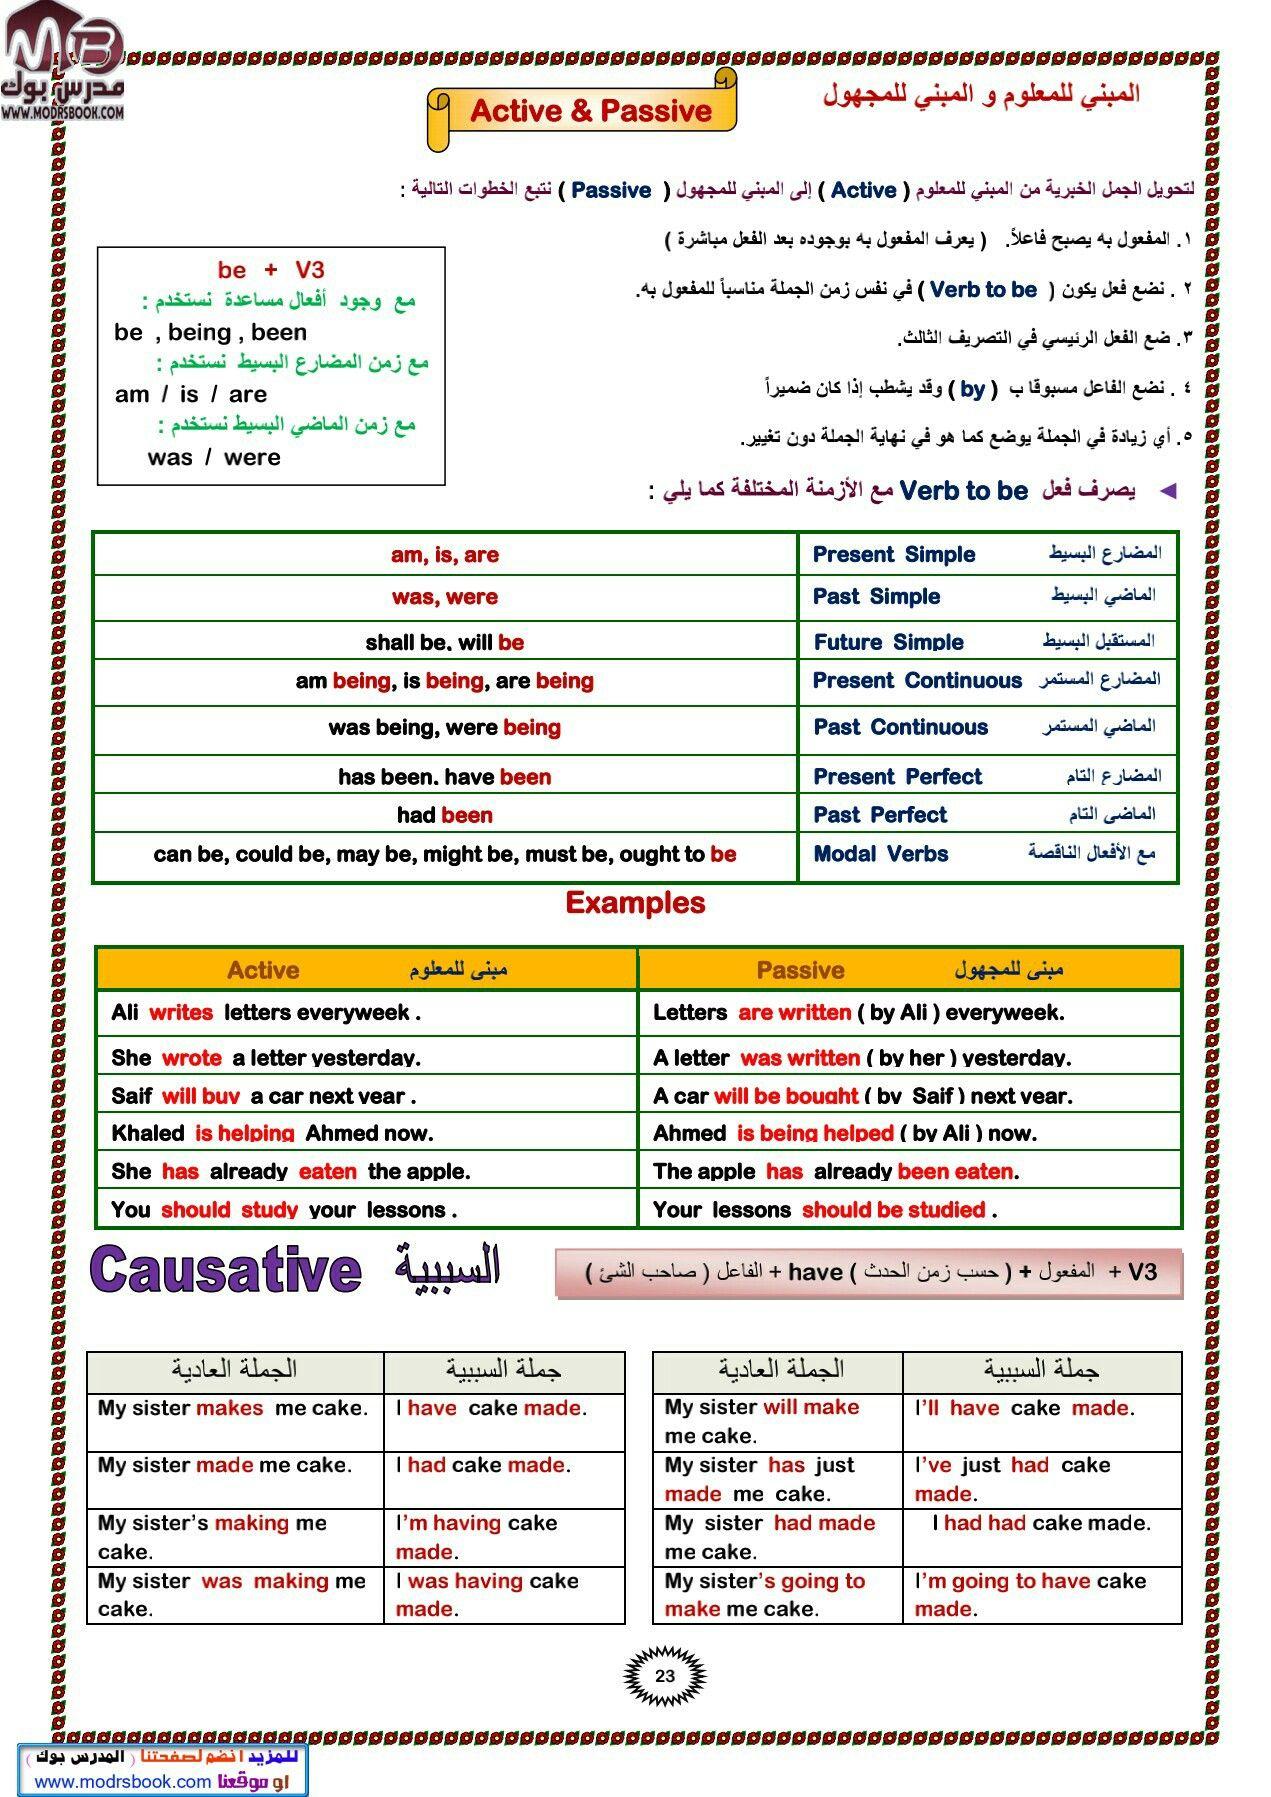 Pin By Ahmad Hamad On اللغة الانكليزية في اربعين صفحة Bullet Journal Journal Continuity